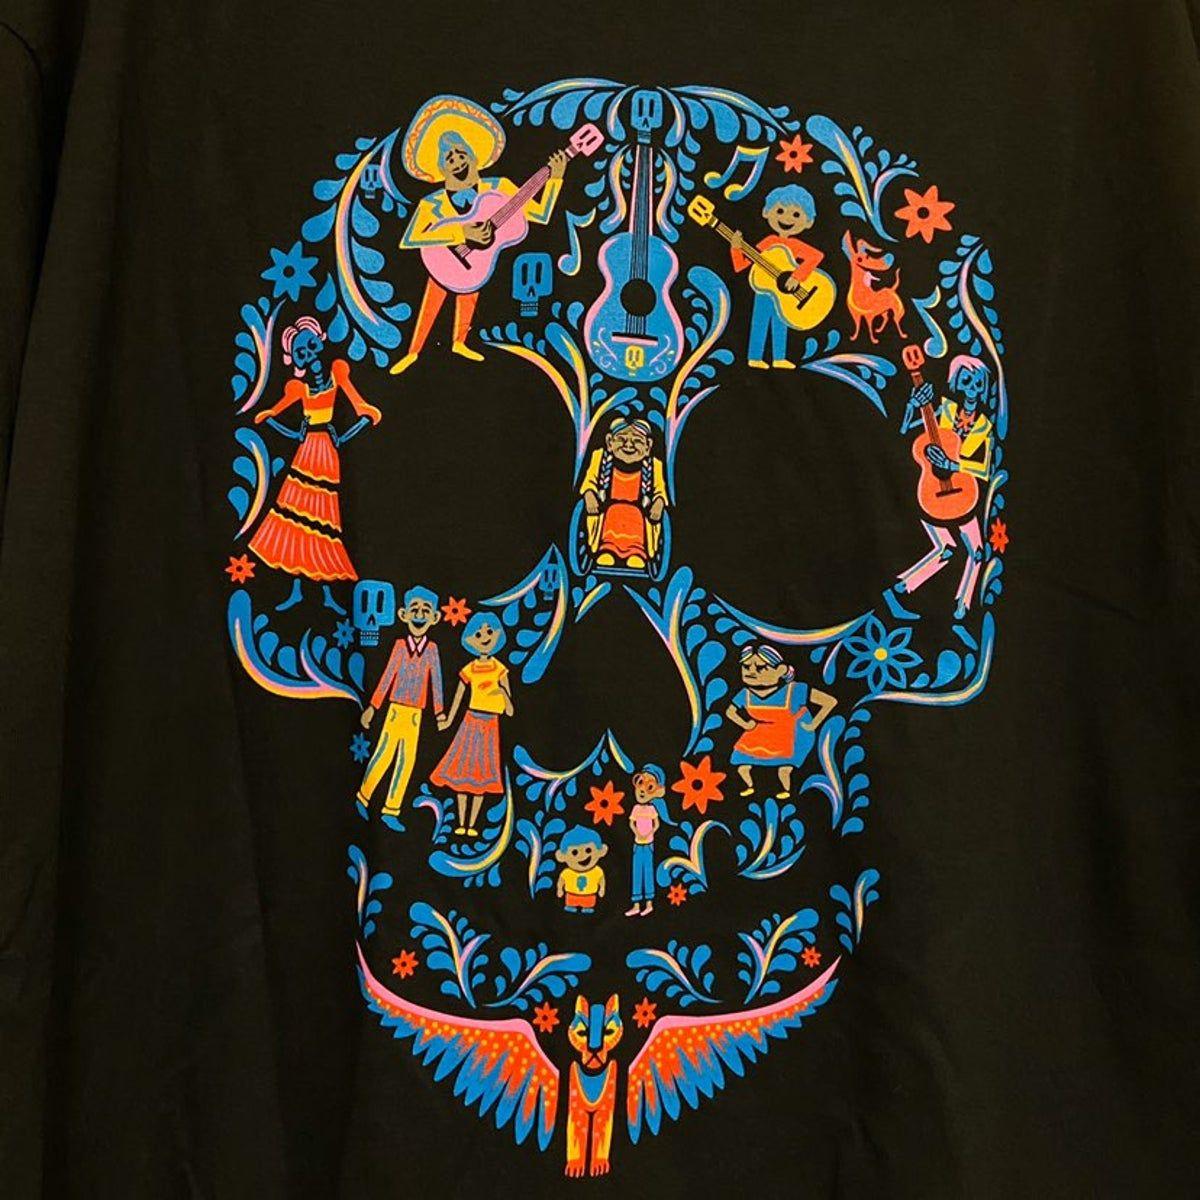 Disney Coco Day of the dead Graphic Tee in 5  Skull art, Sugar